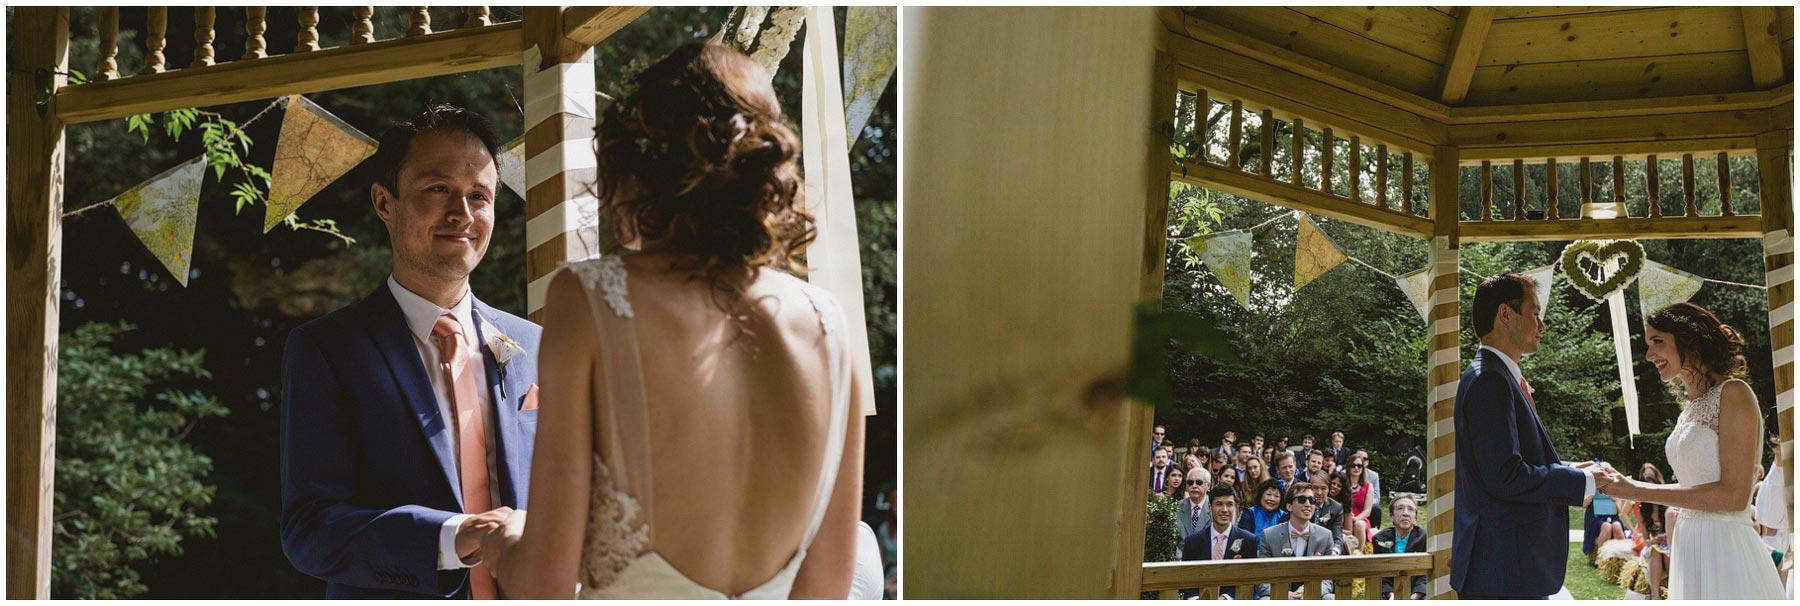 Colehayes-Park-Wedding-Photography_0083